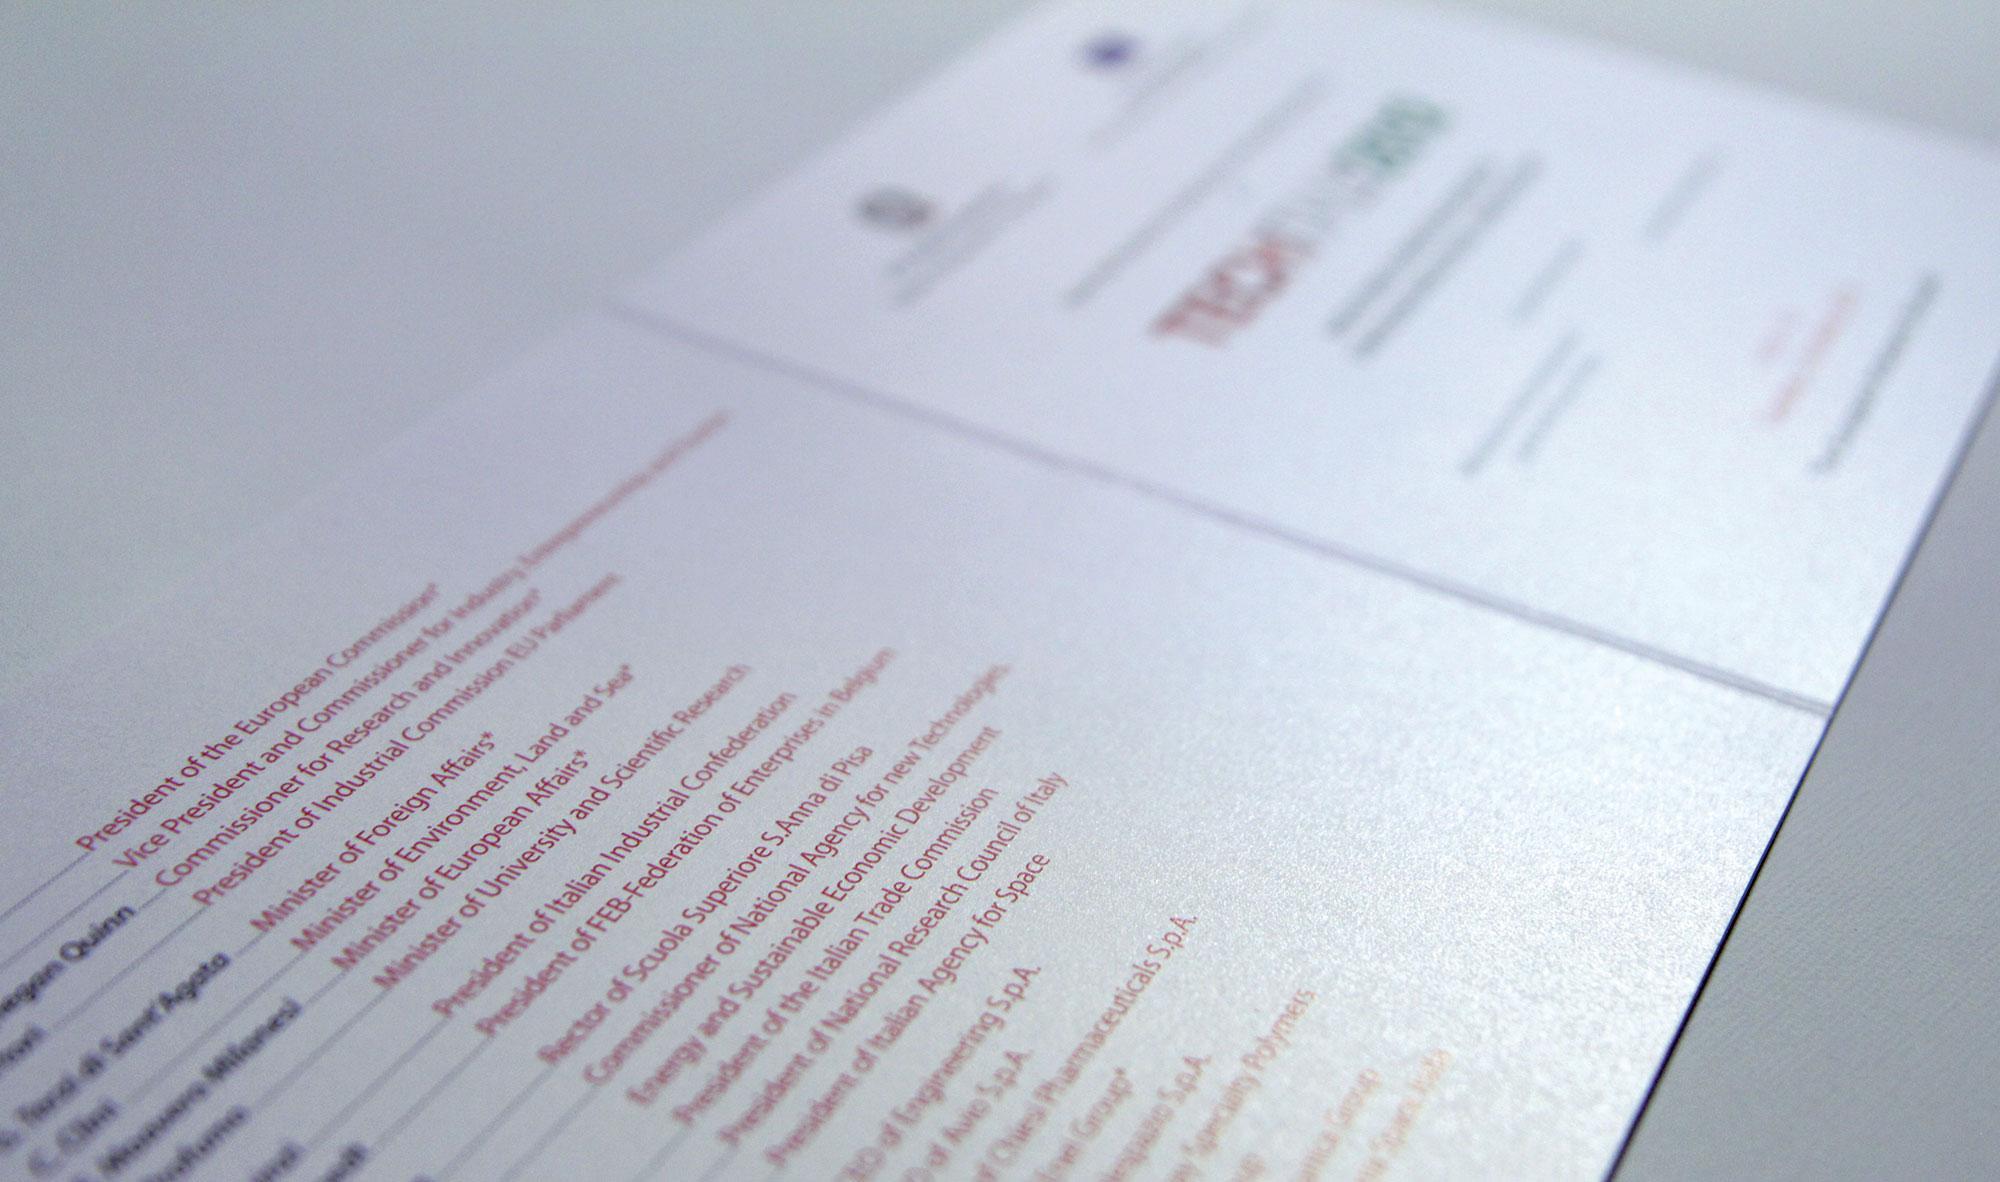 graphic-designer-free-lance-bologna-ambasciata-italiana-bruxelles